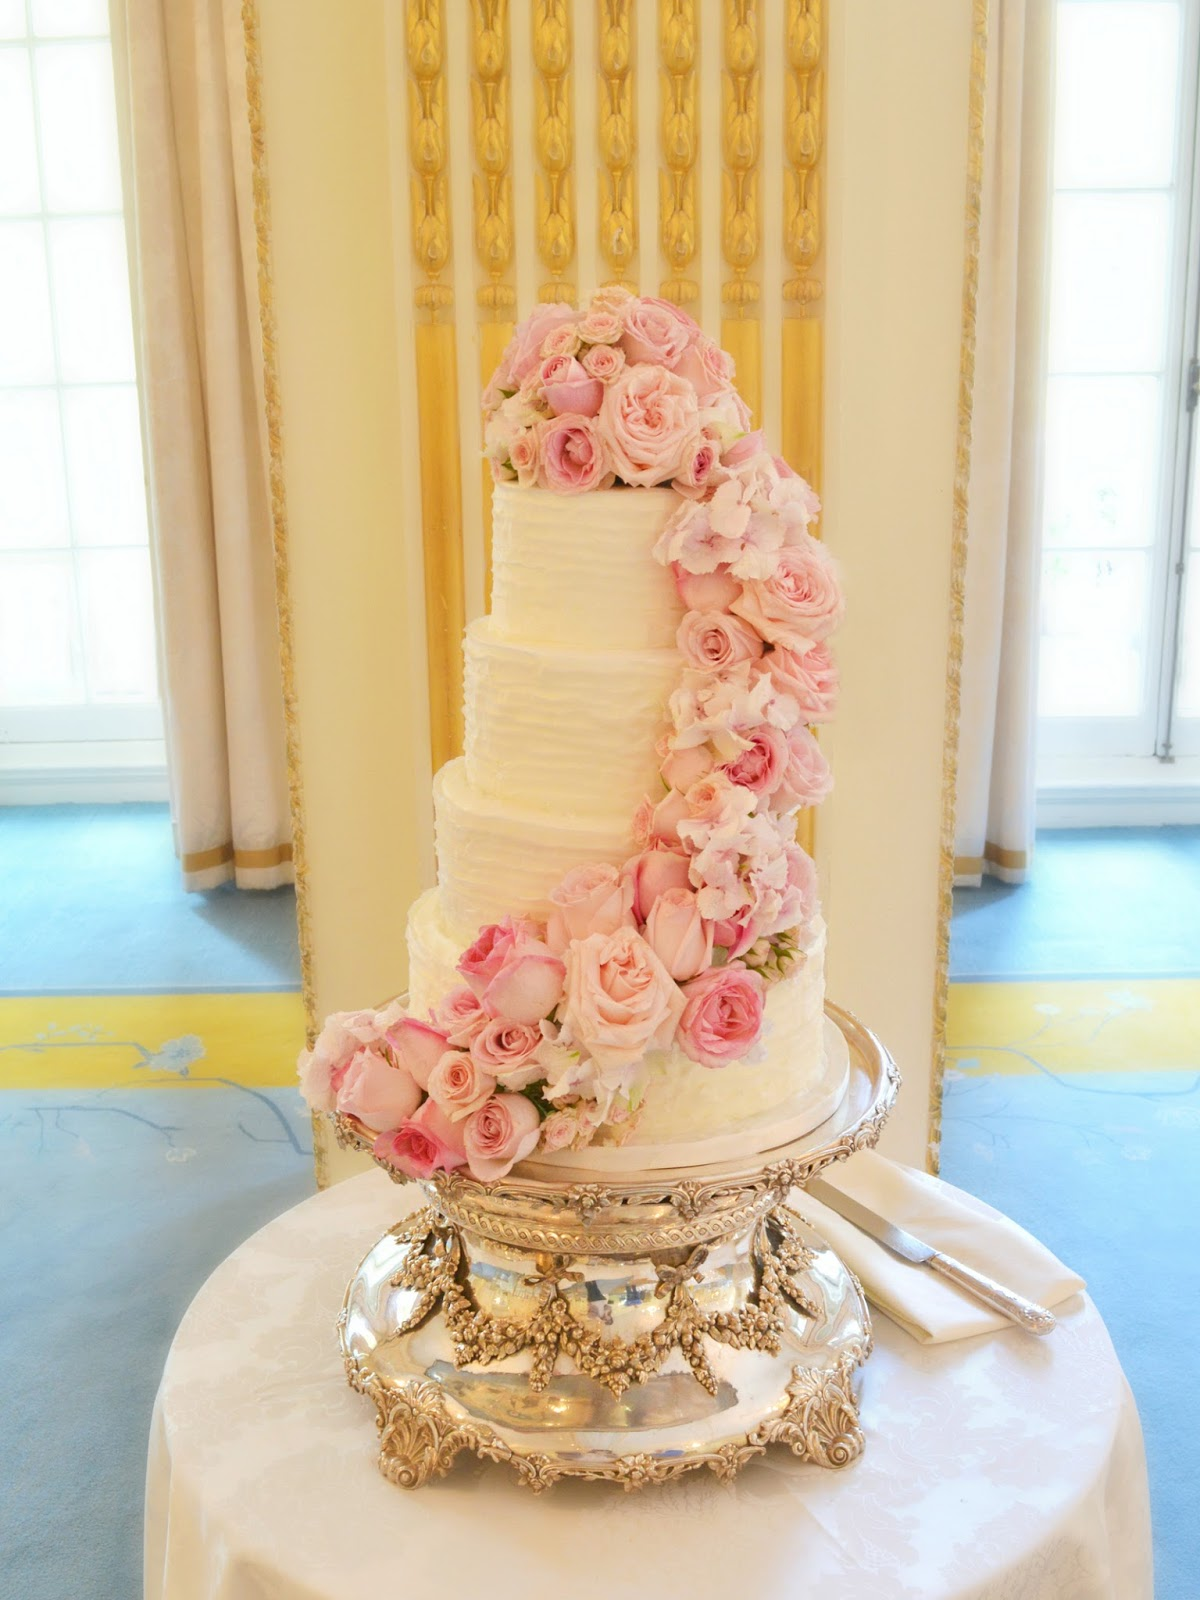 Pink Roses Wedding Cakes for Your Spring Wedding   Wedding Celebration